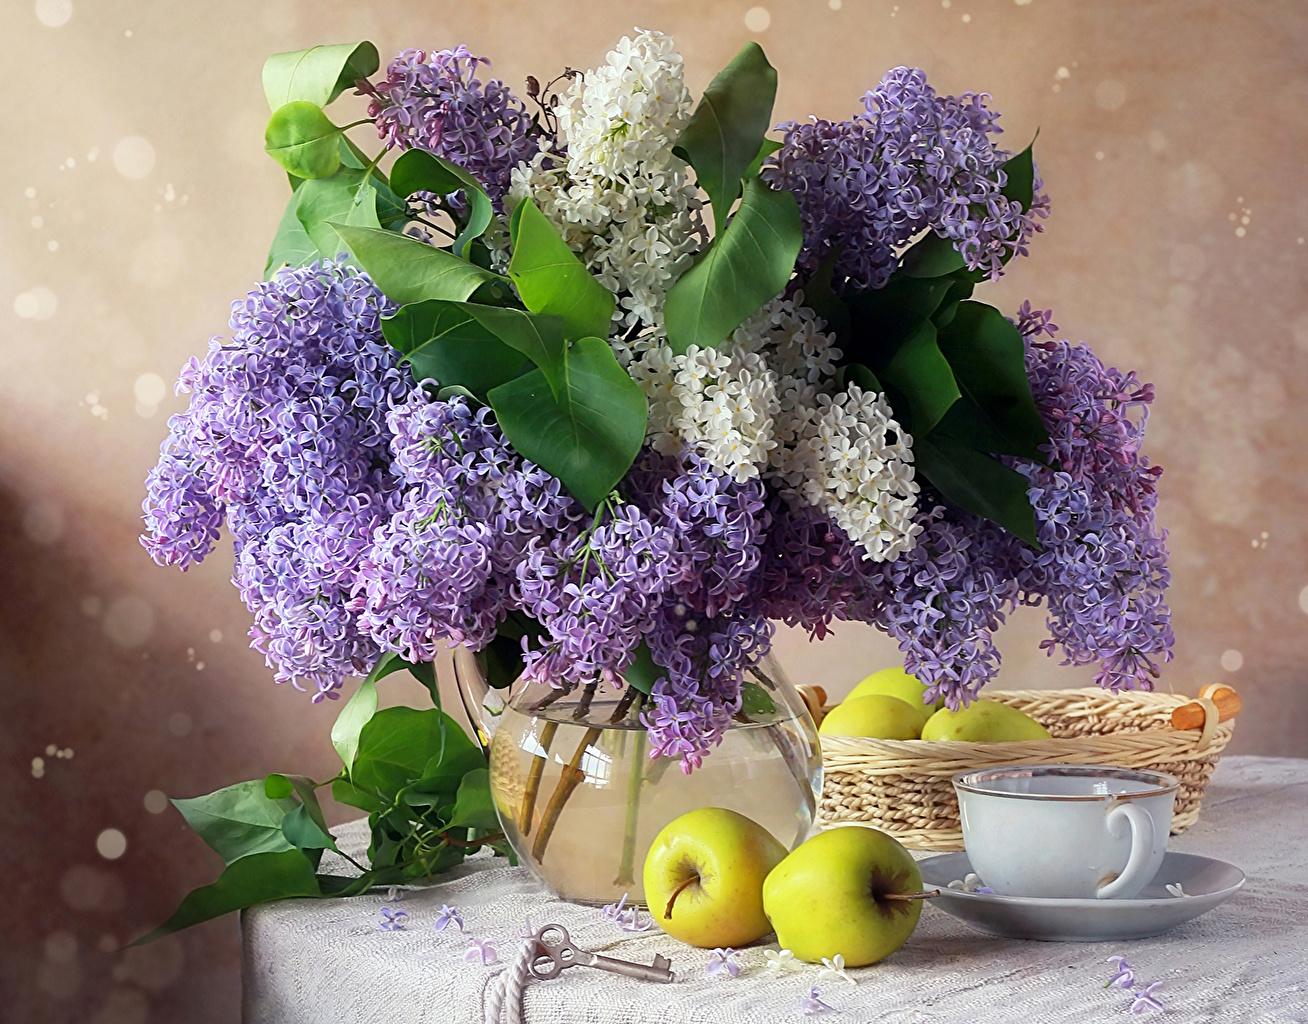 Натюрморт цветы обои на рабочий стол